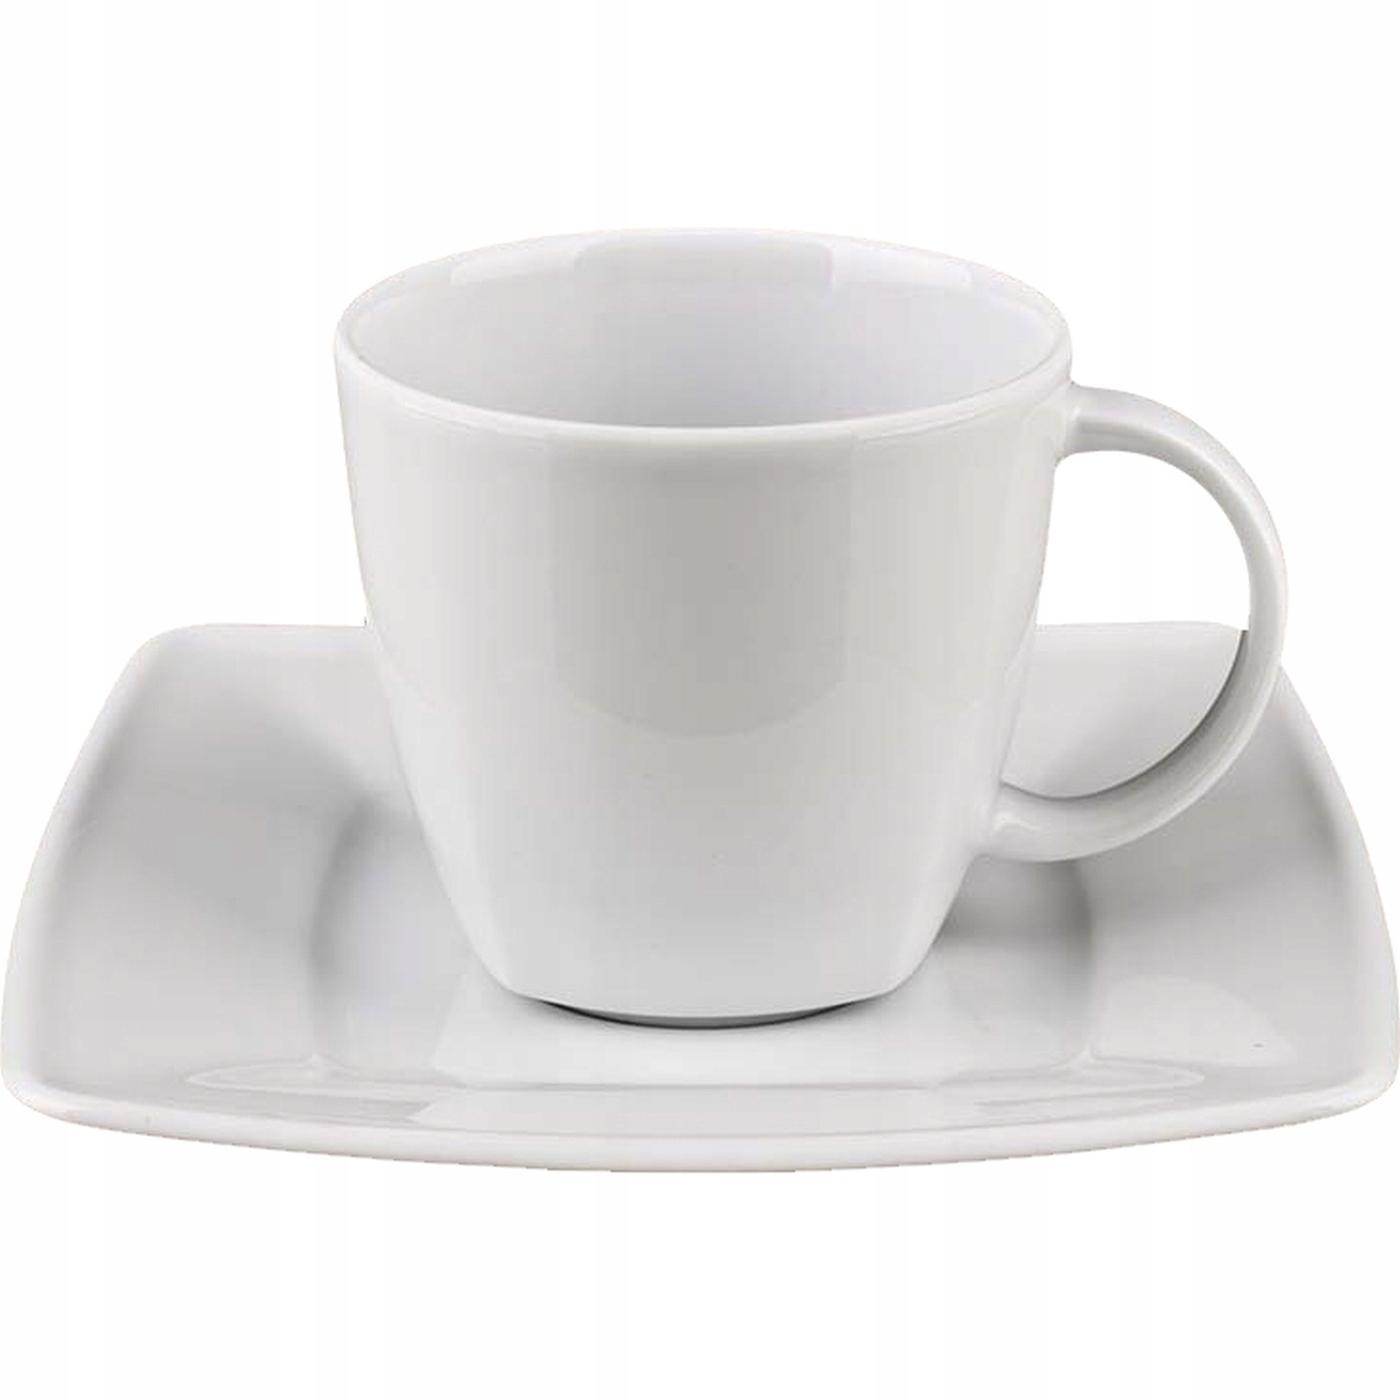 Фарфоровая чашка и блюдце Lubiana Victoria 250 мл